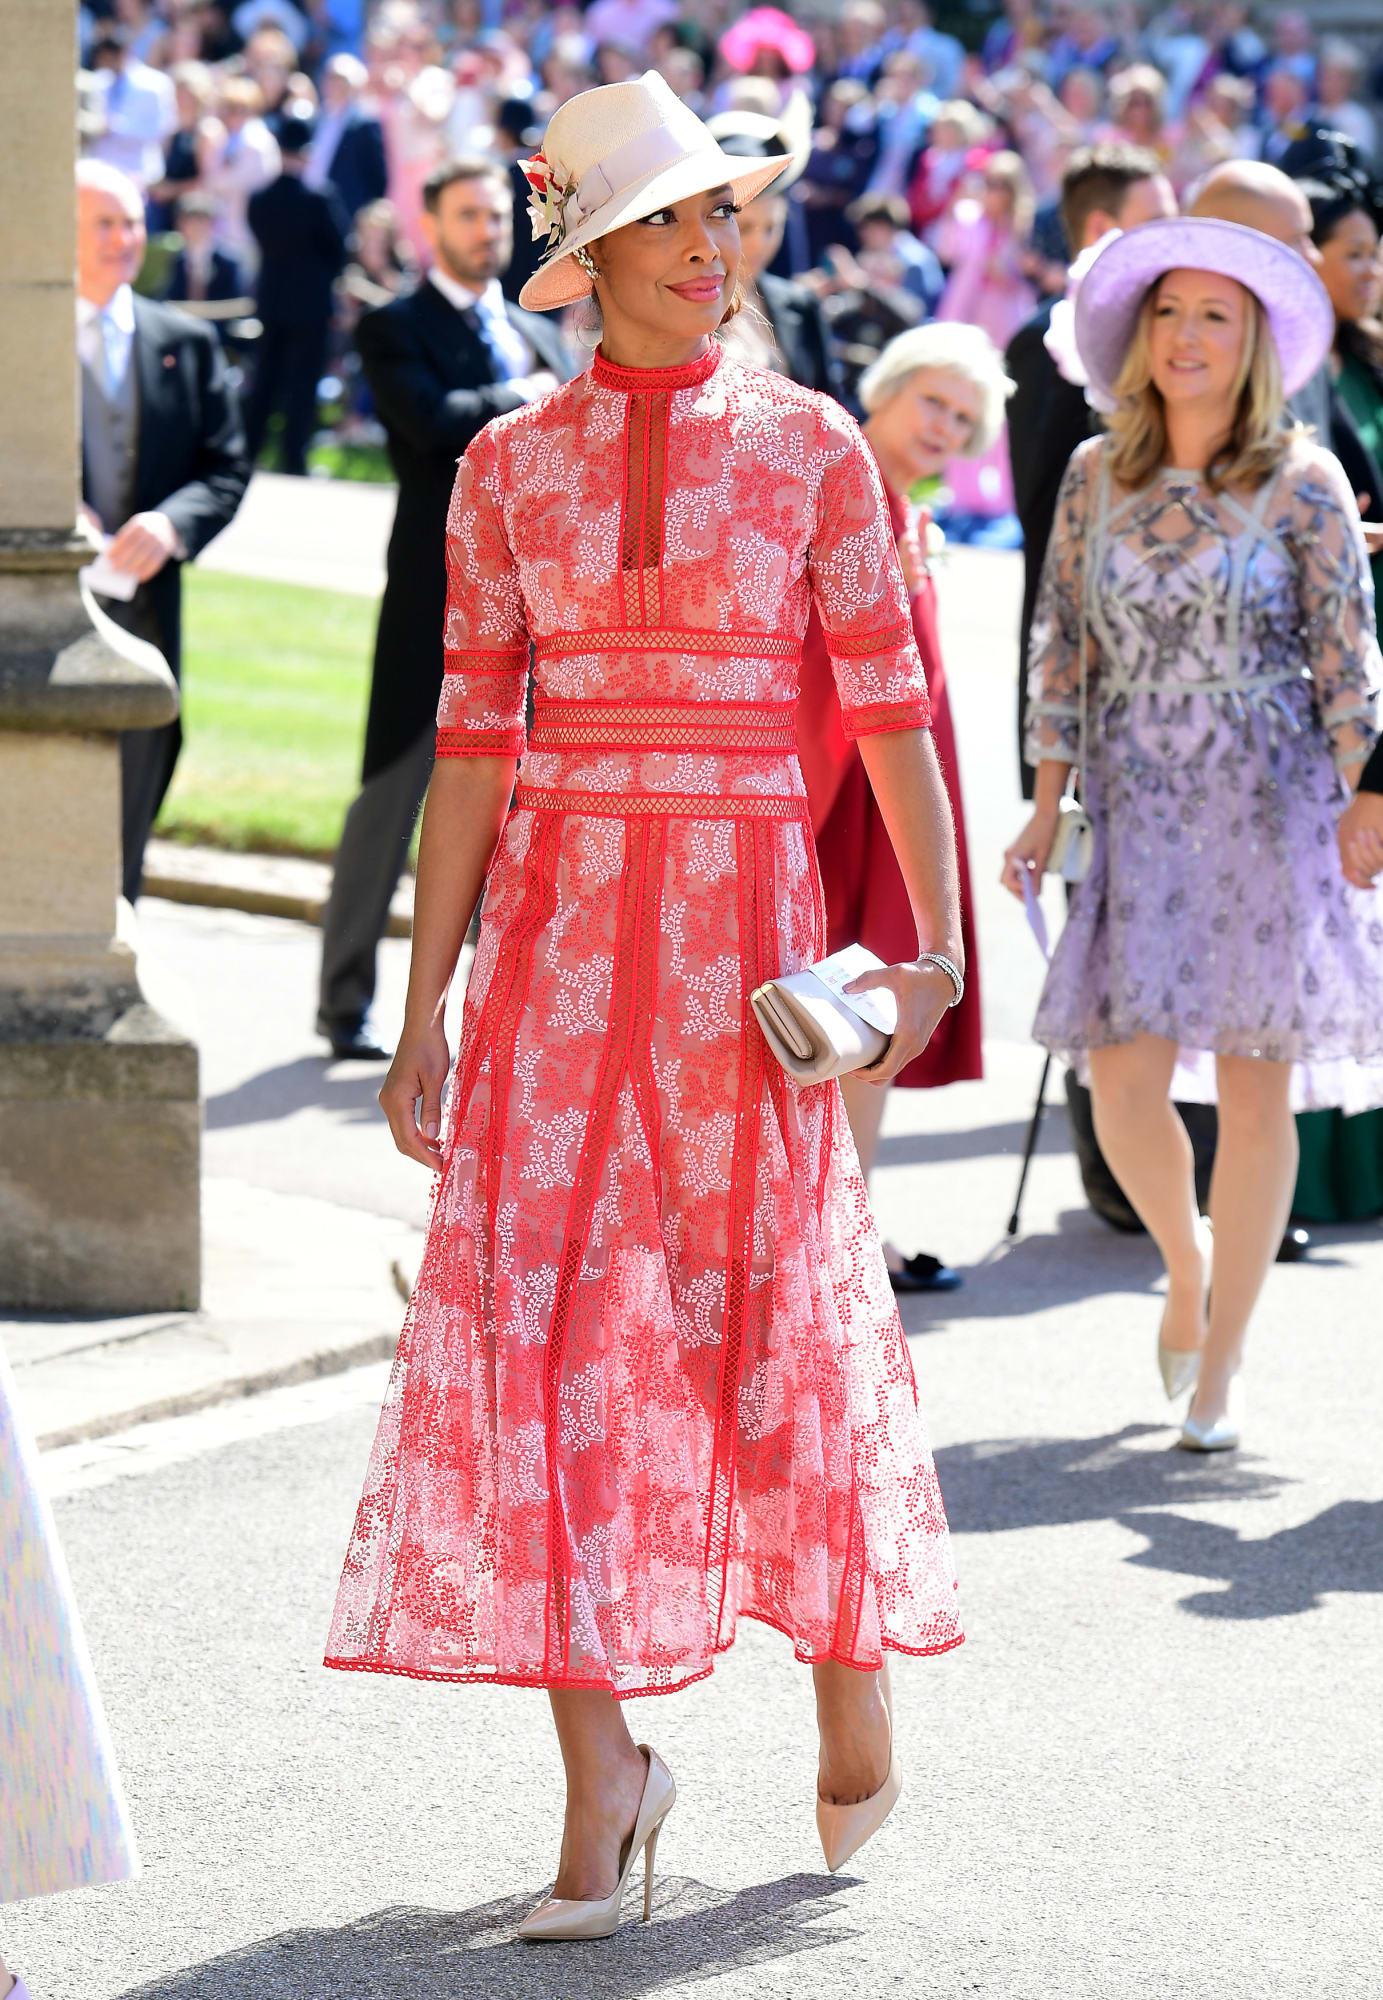 royal-wedding-guests-4.jpg